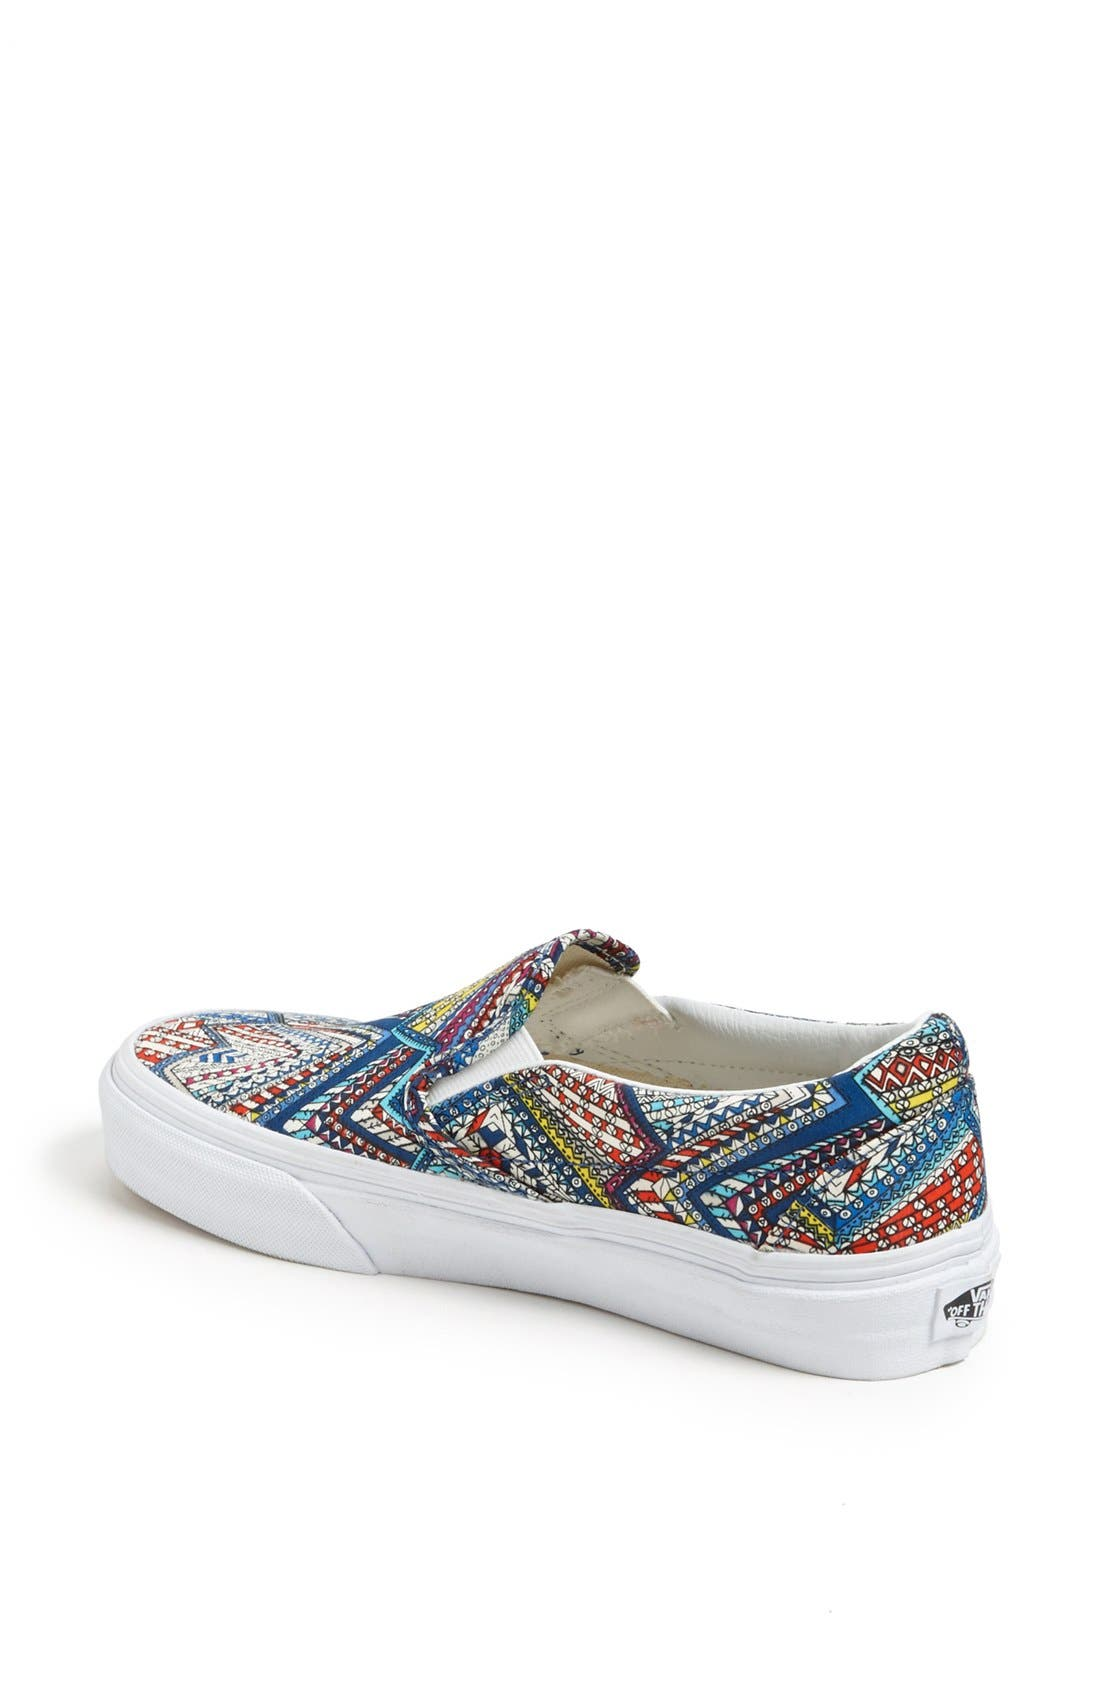 Alternate Image 2  - Vans 'Classic - Abstract' Sneaker (Women)